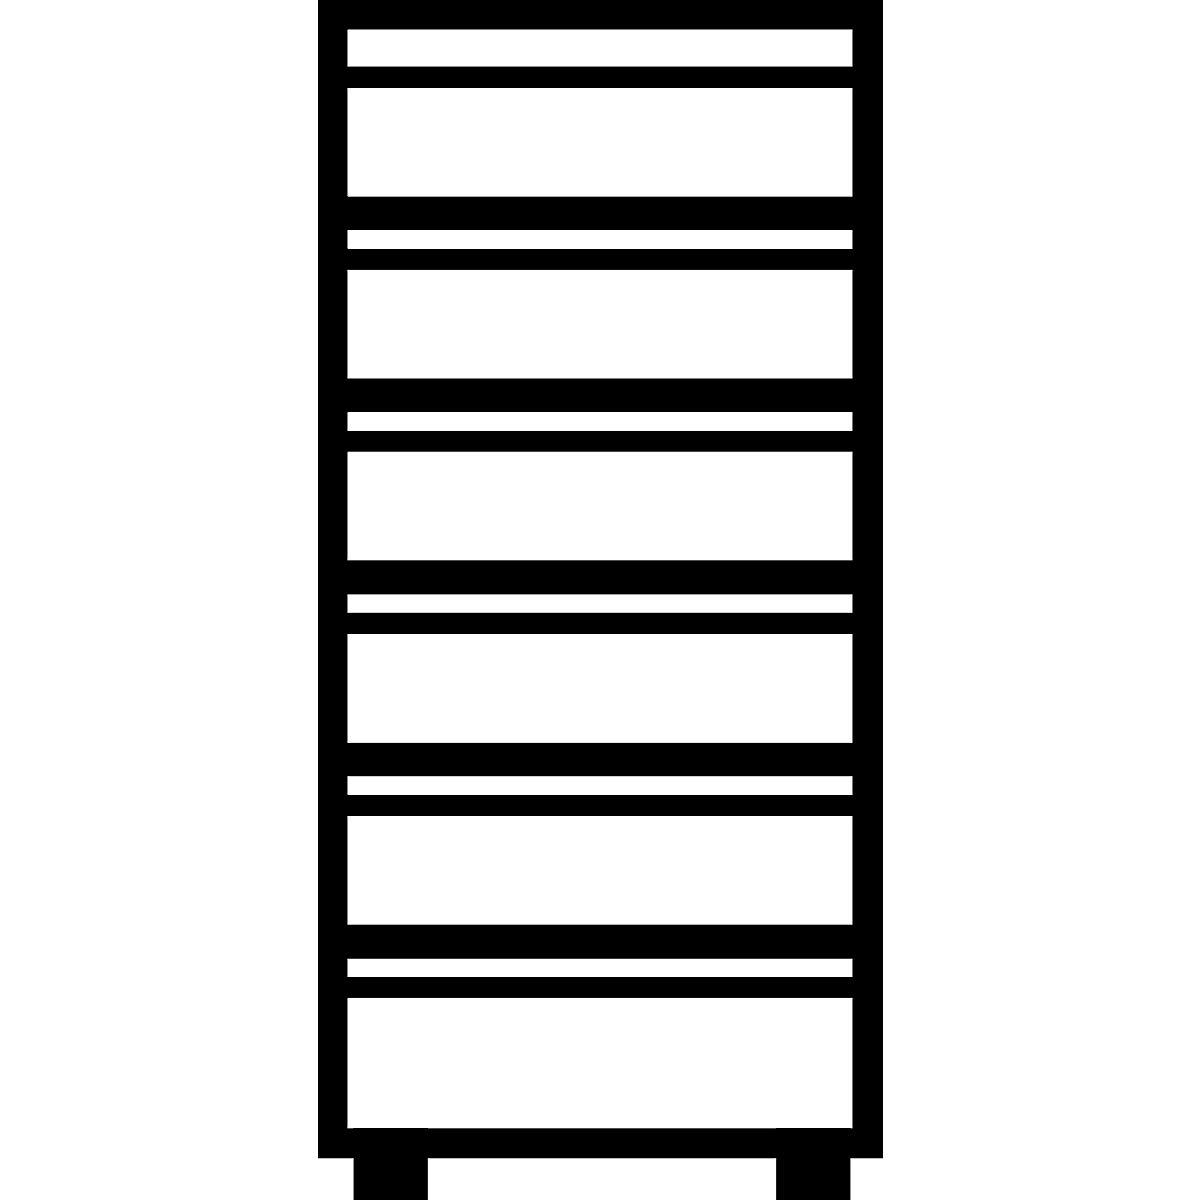 Griffleisten Buroschrank Hangeregisterschrank